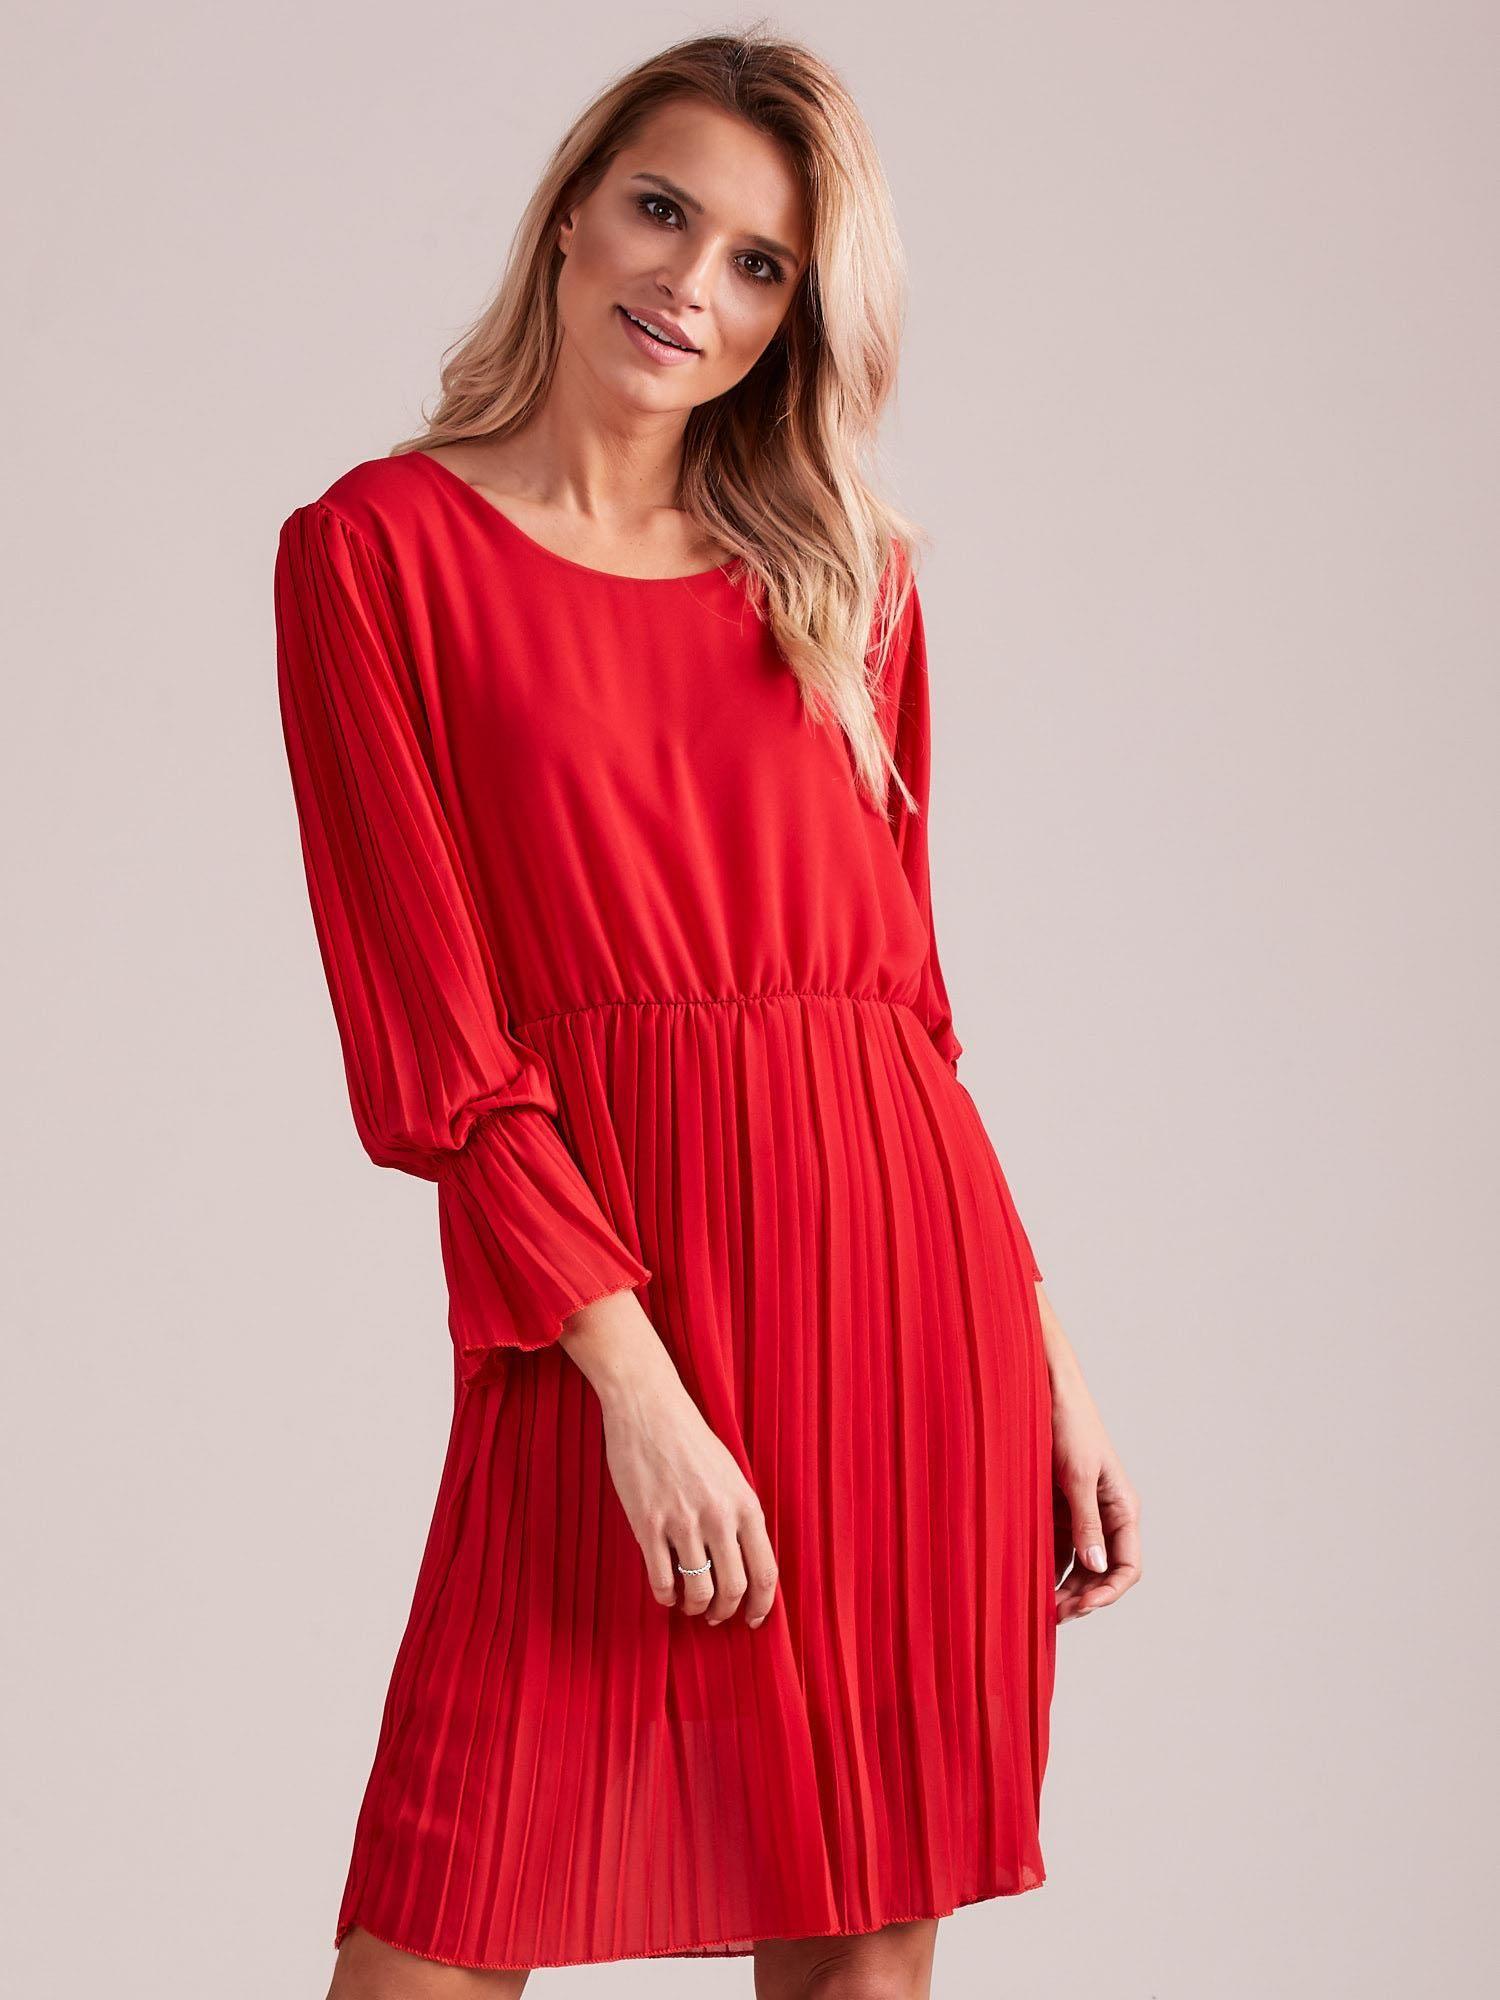 8be35d7a49a3ab Czerwona plisowana sukienka - Sukienka koktajlowa - sklep eButik.pl